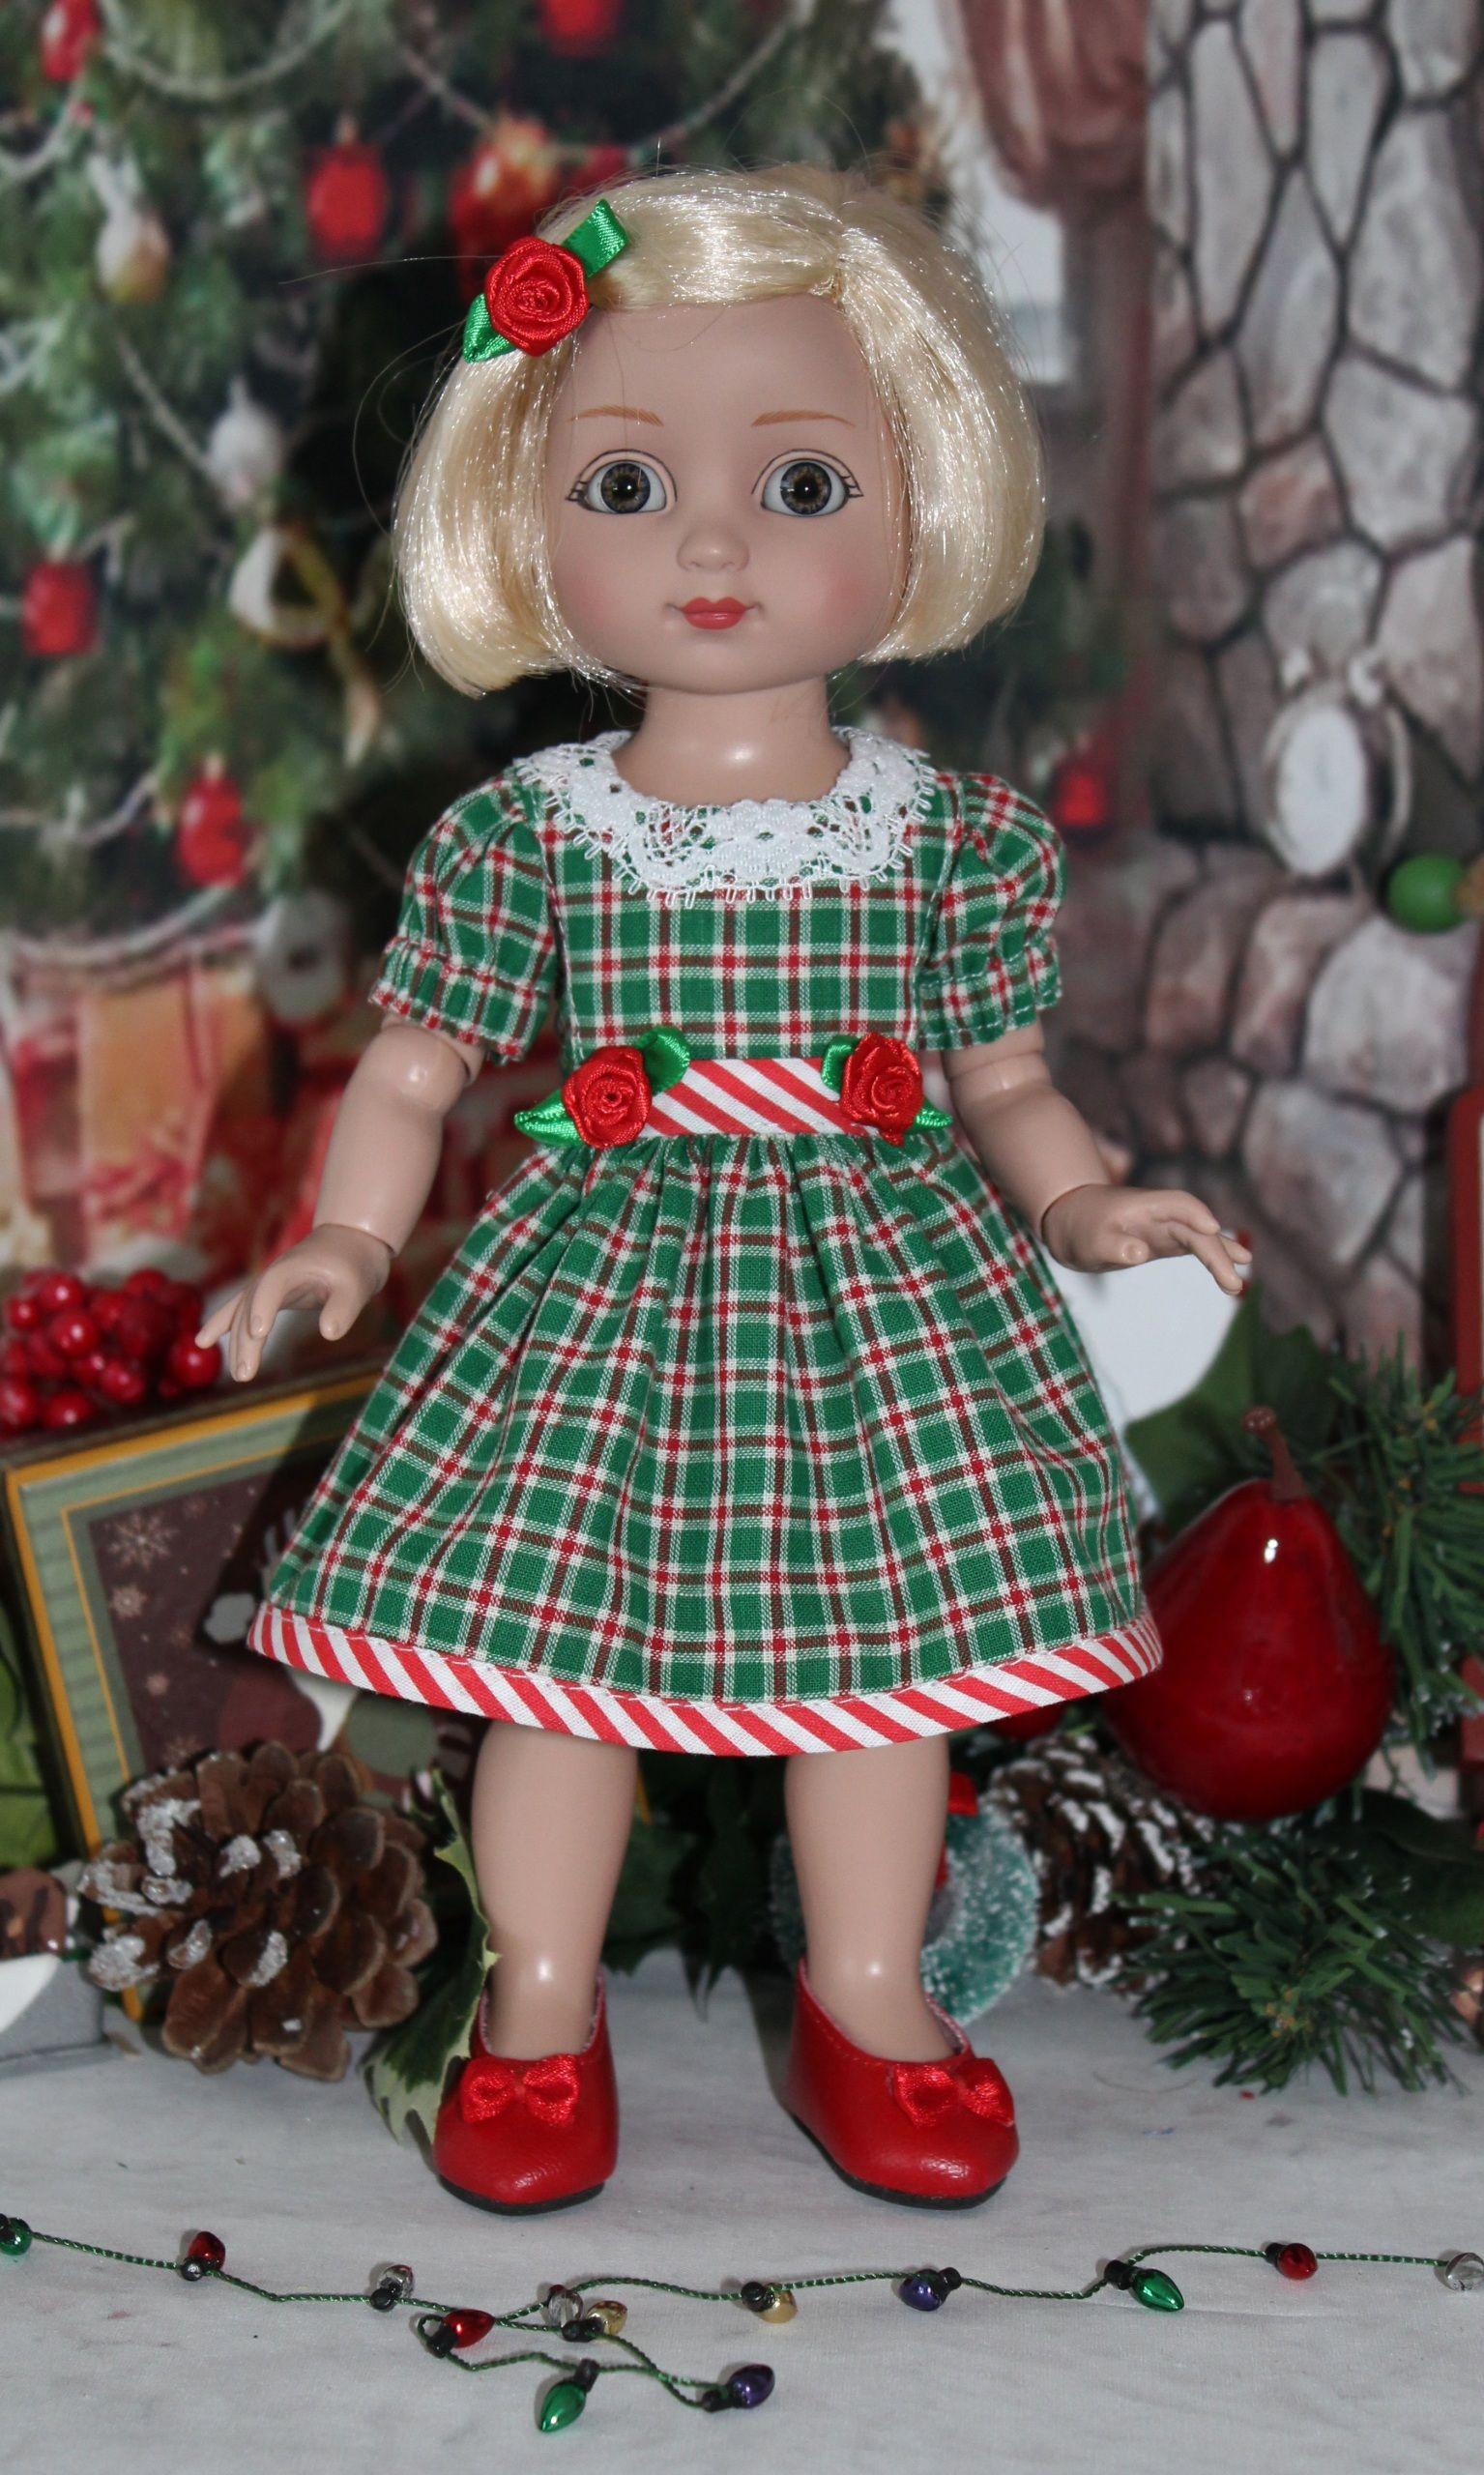 "Charming Christmas Plaid fits 10"" Tonner Ann Estelle/Patsy"